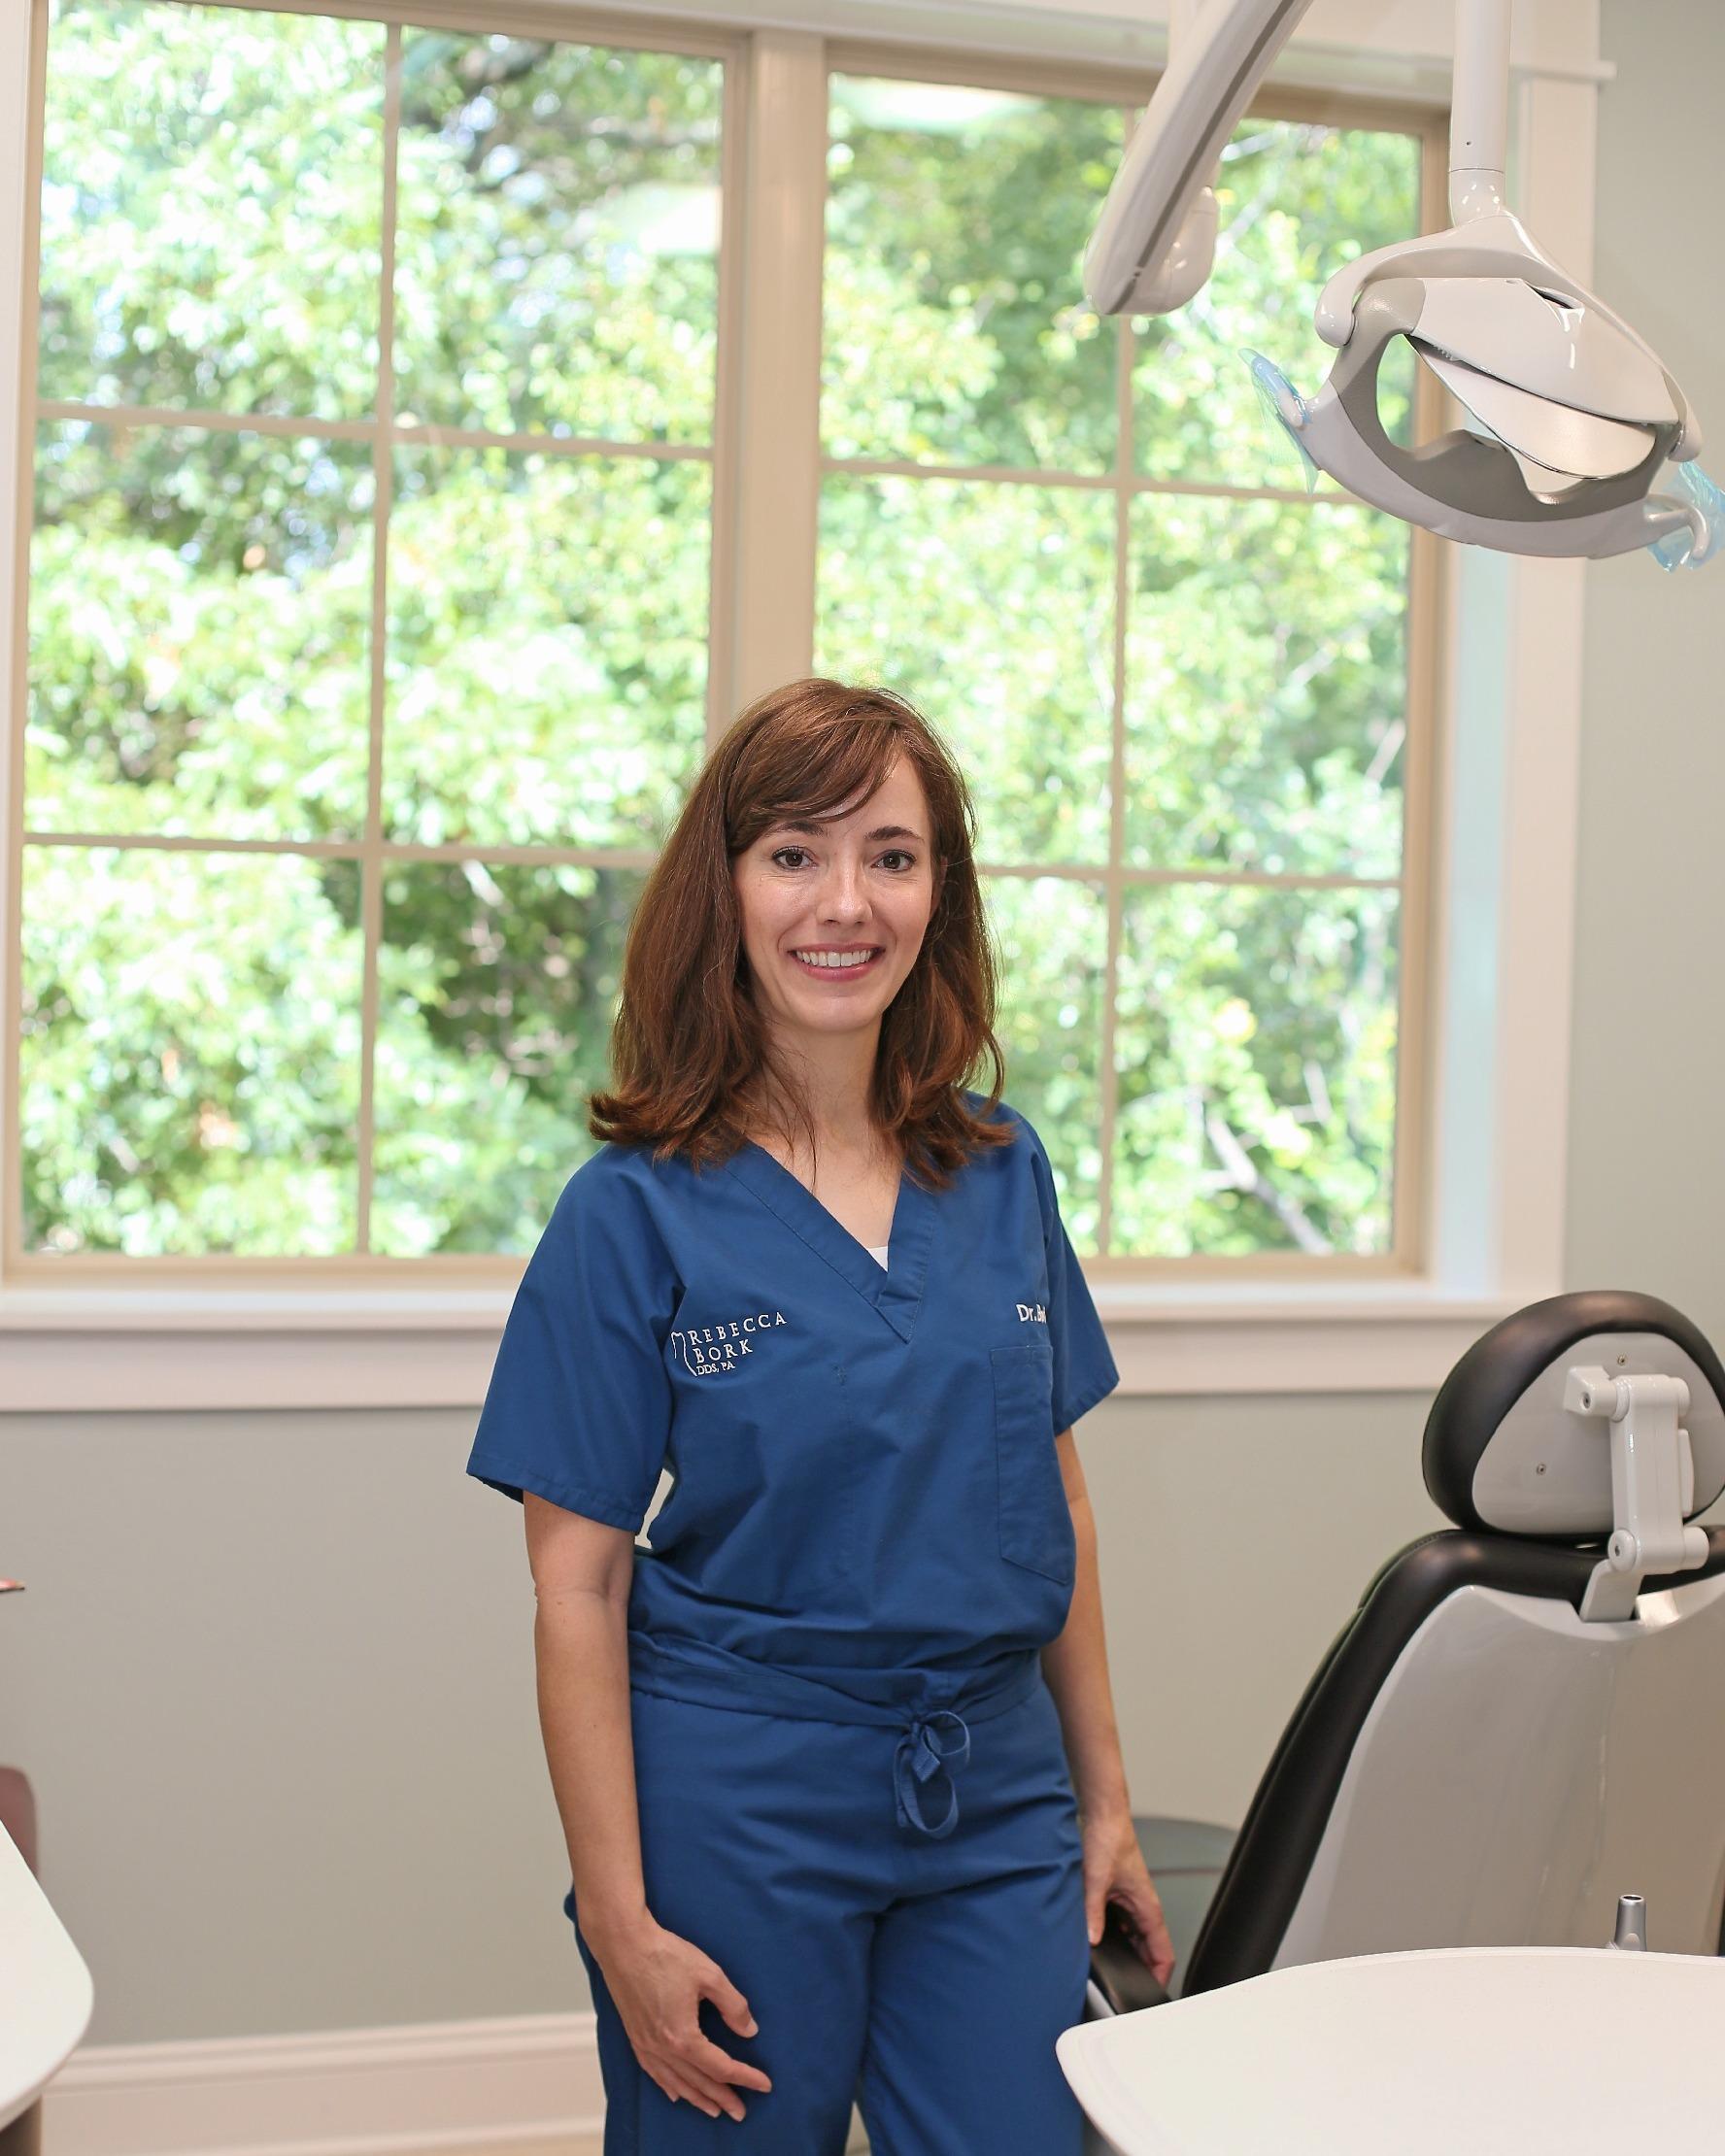 Dr. Rebecca Bork Family Dentistry image 4